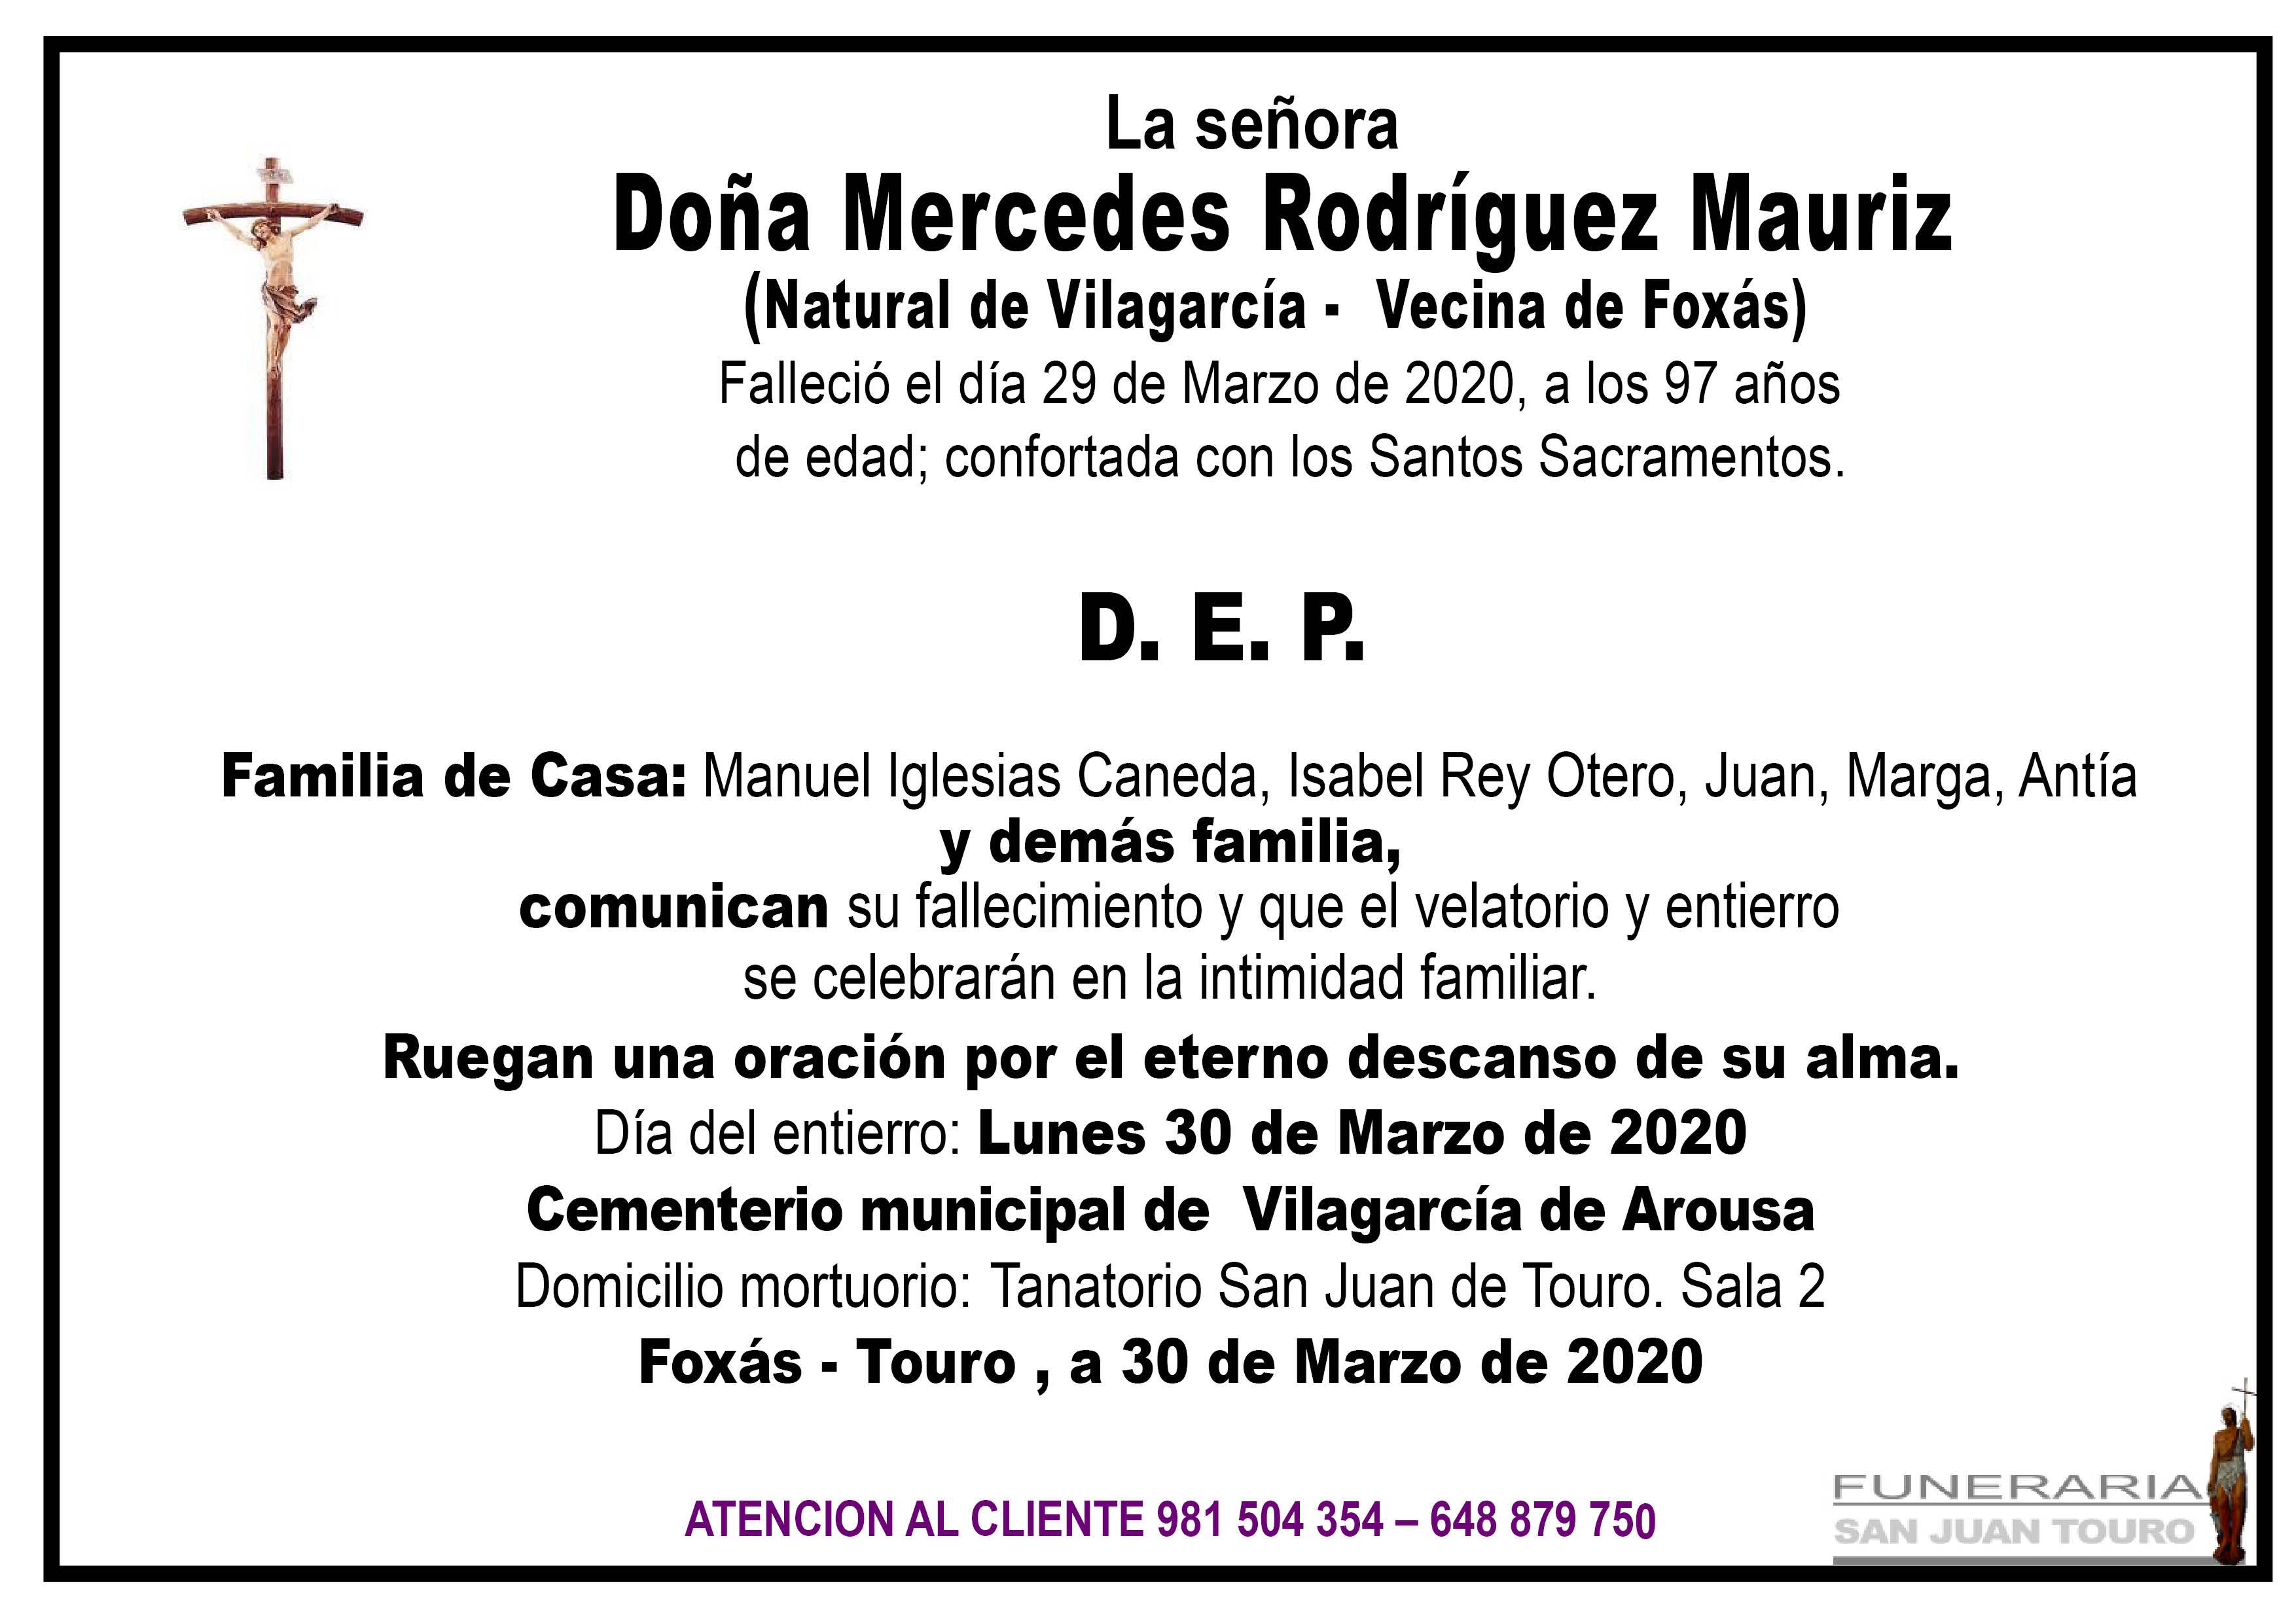 Esquela de SEPELIO DE DOÑA MERCEDES RODRIGUEZ MAURIZ